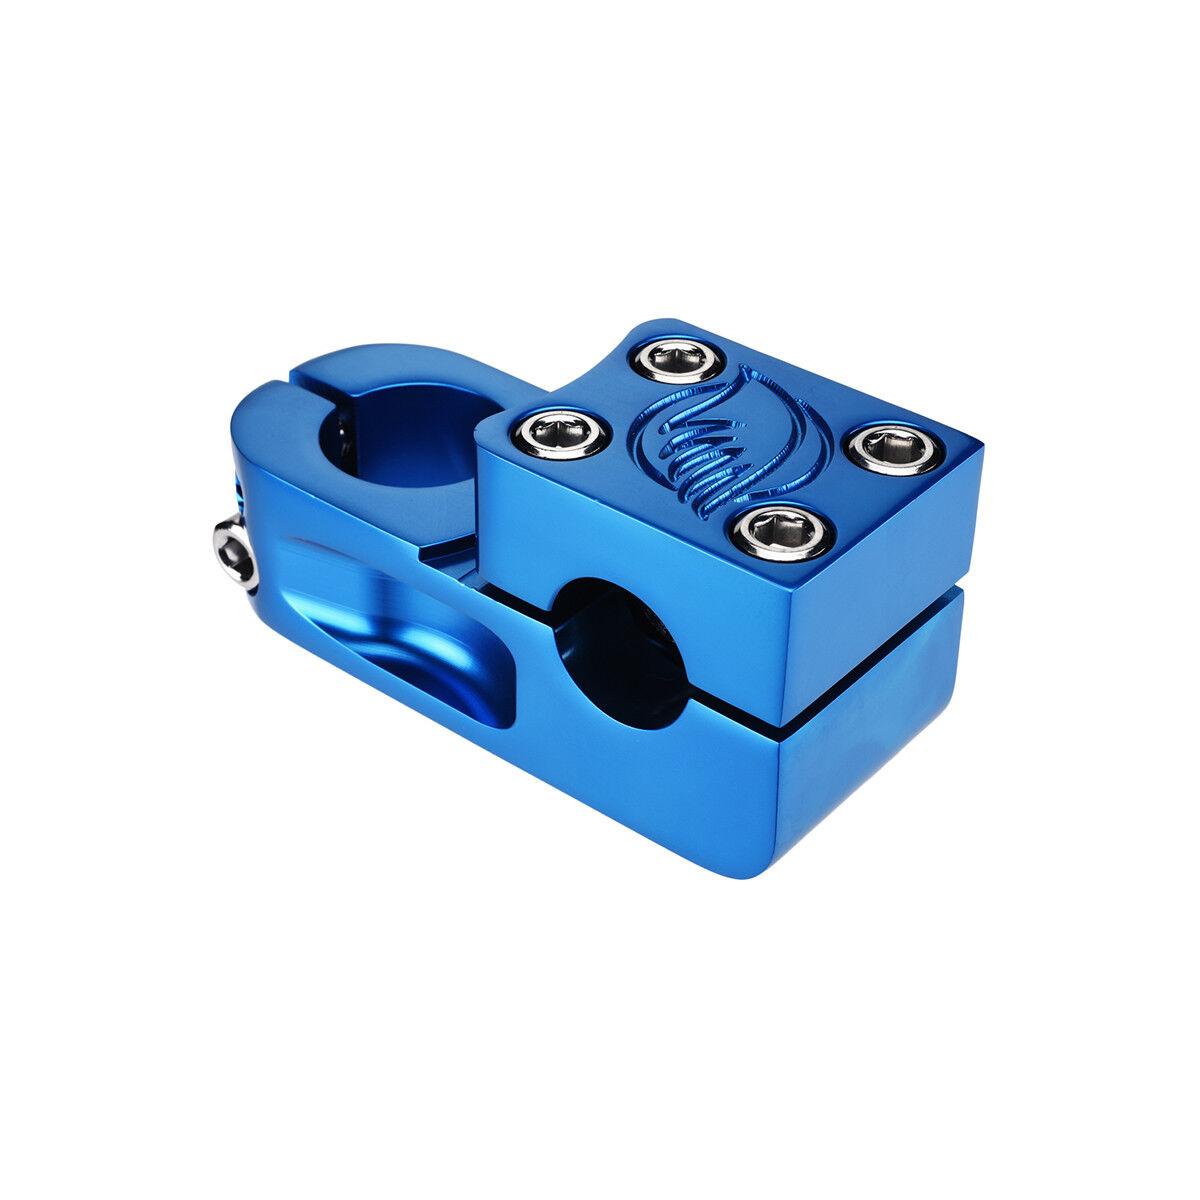 STEM SE RACING NARLER 55x22.2x28.6 0d BMX blueeE 1 1 8